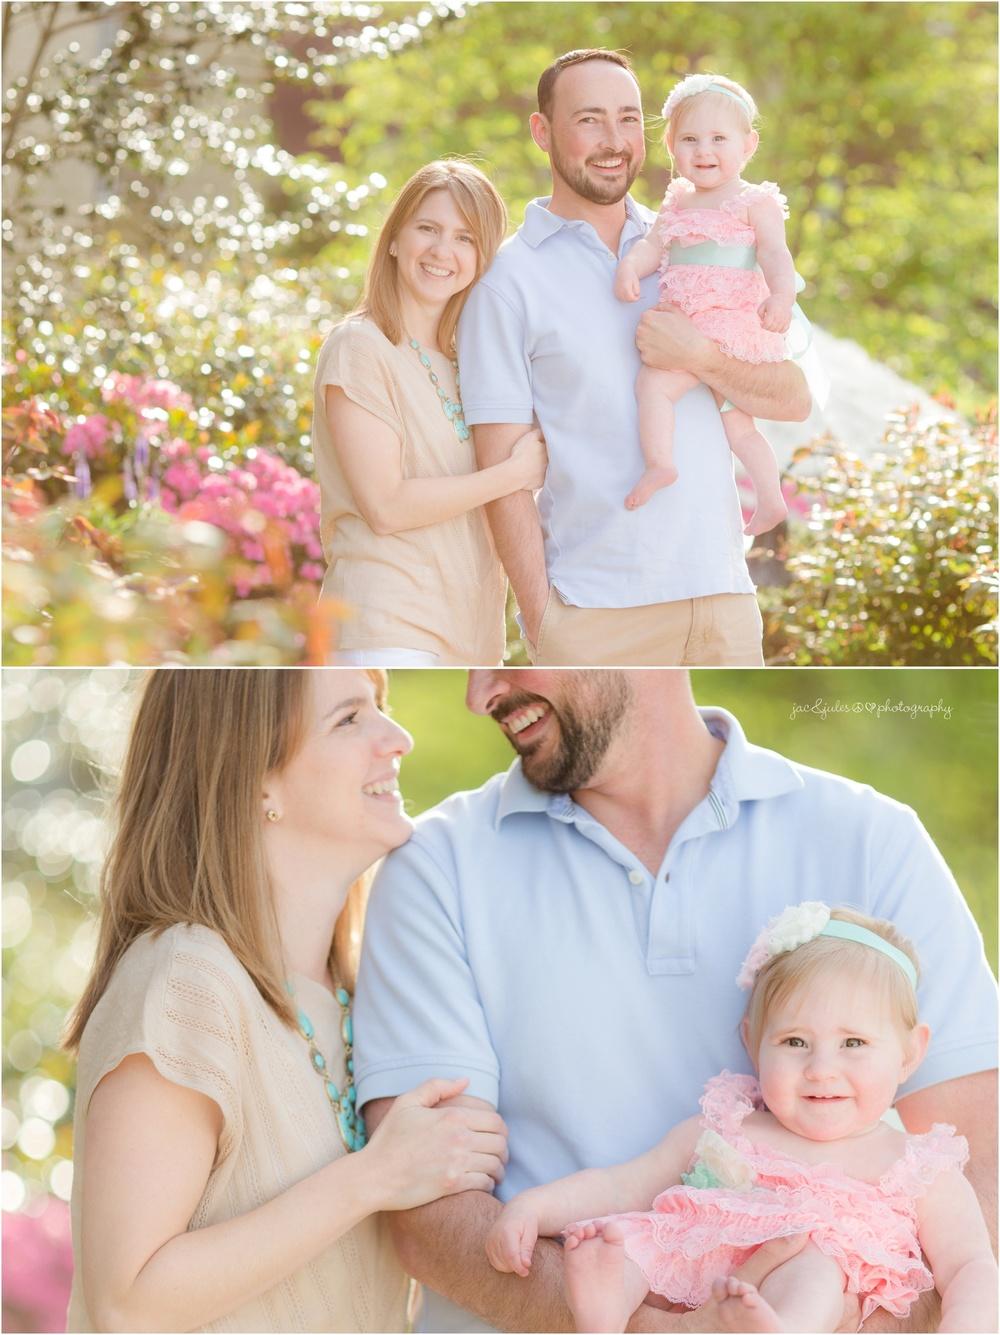 Family photos at St. Catherine's Church in Spring Lake, NJ